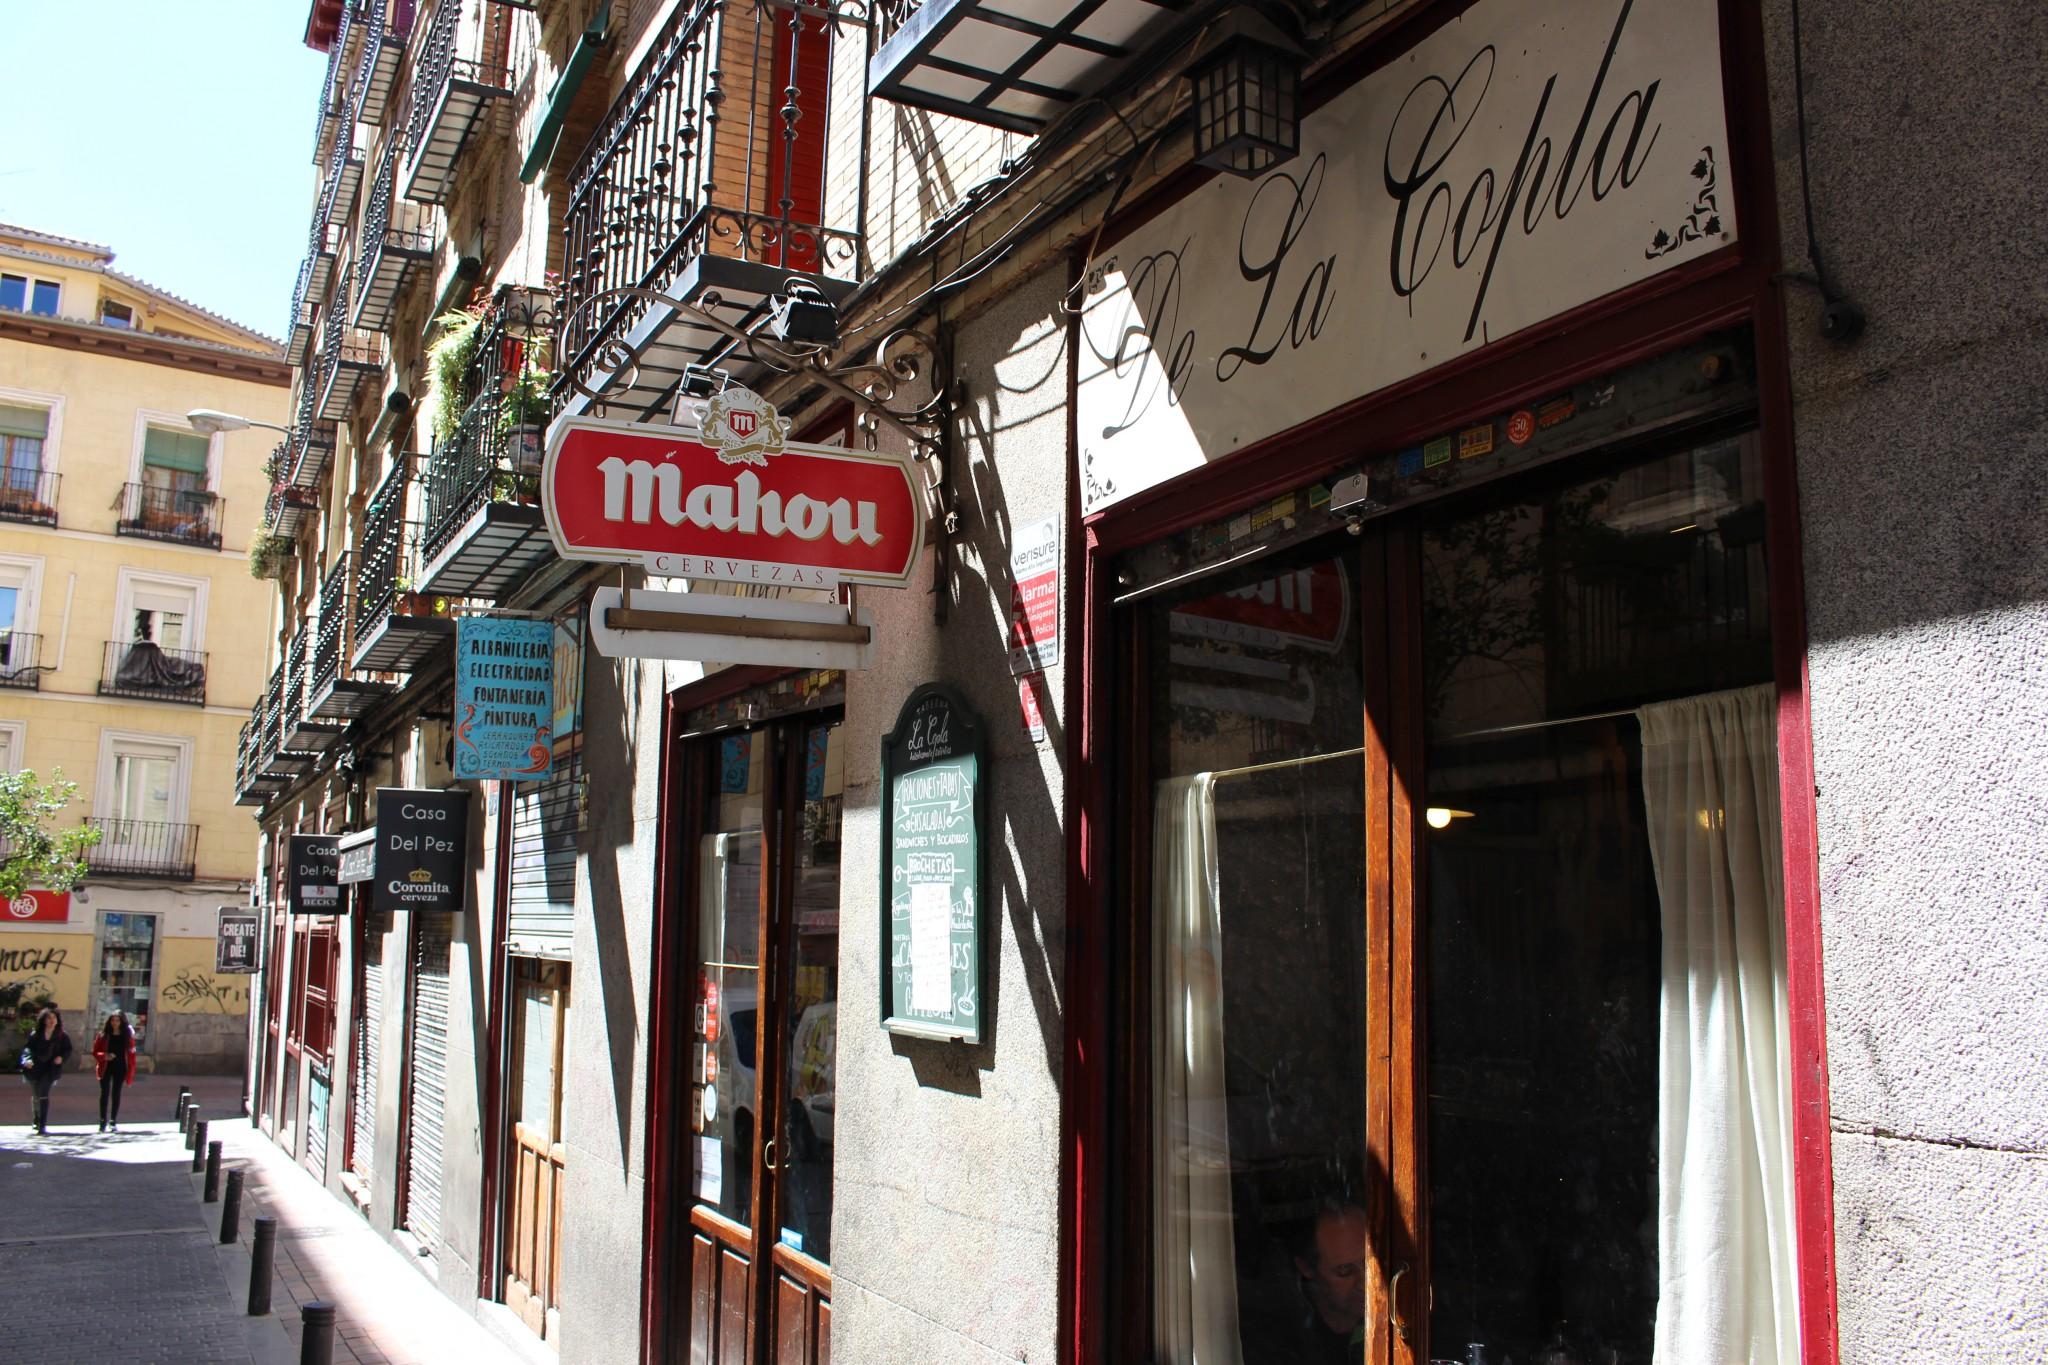 La Copla - Tabernas Madrid